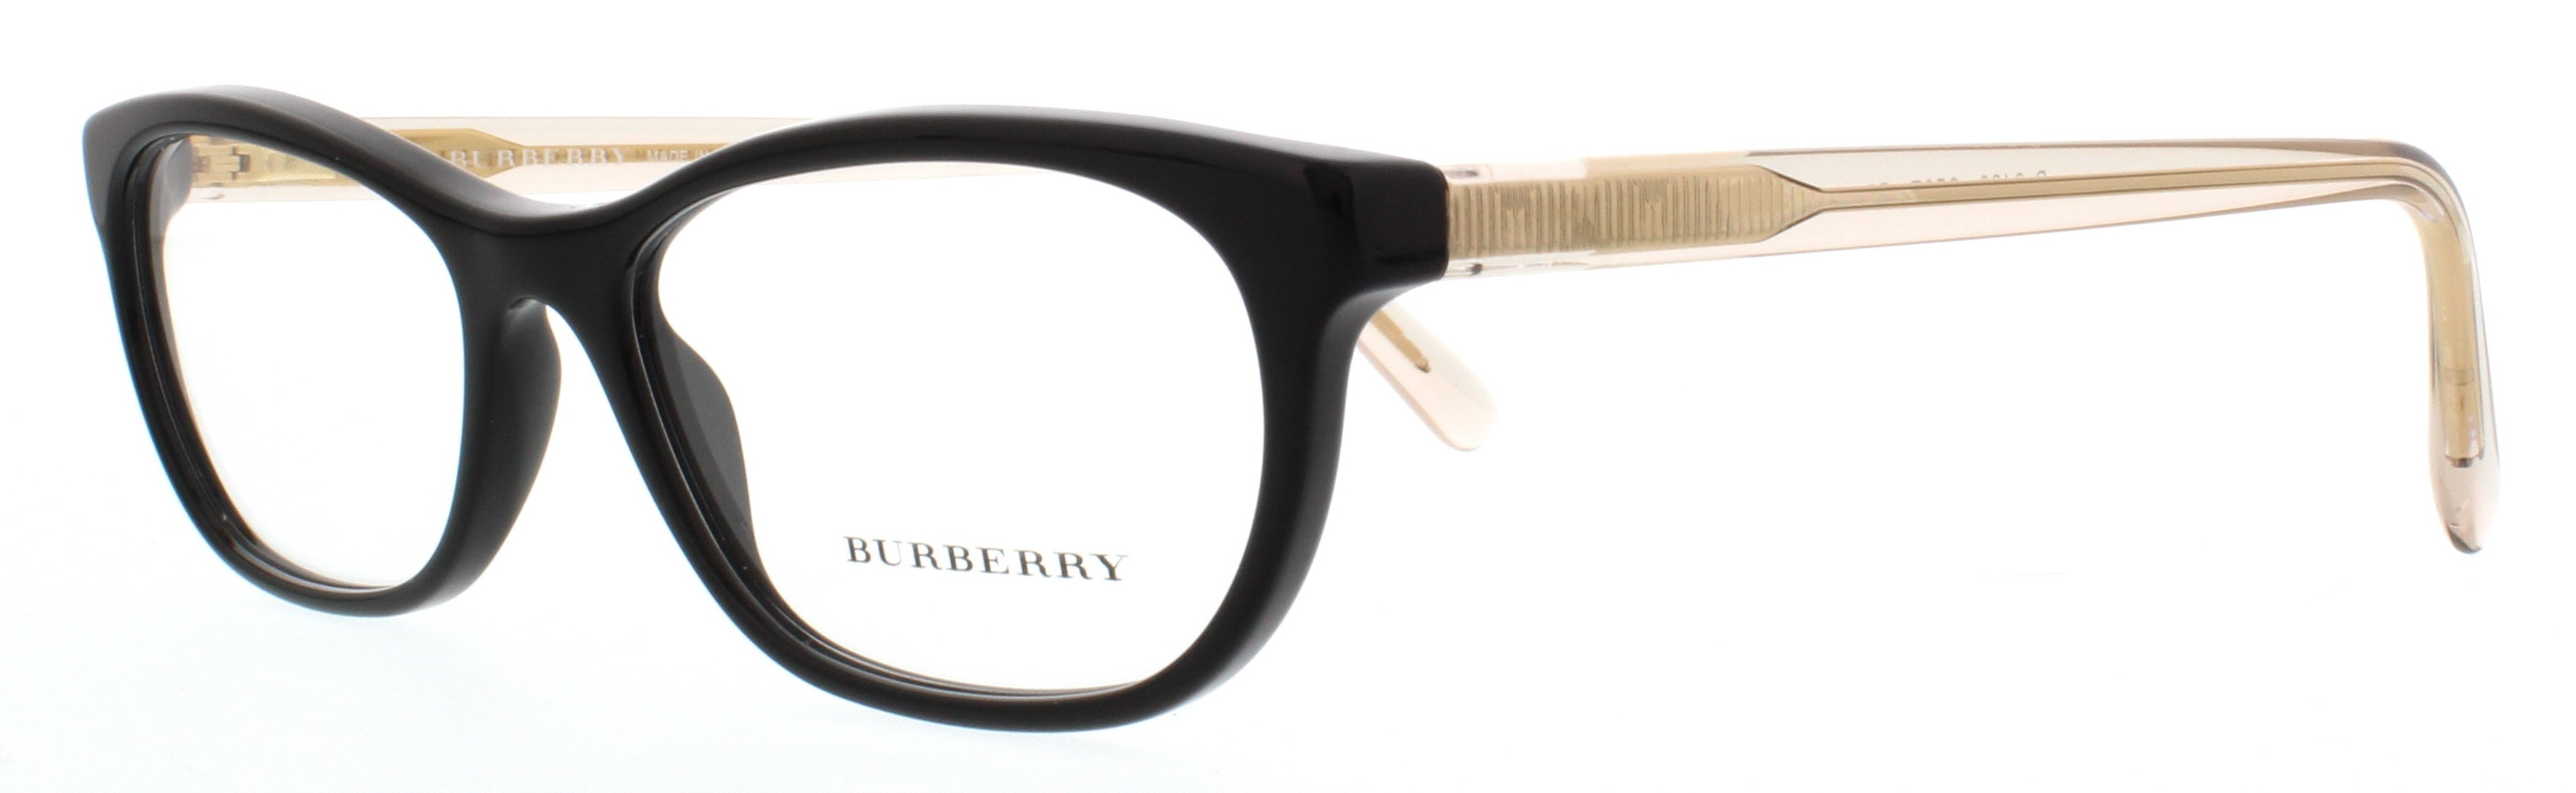 525ffd2645 BURBERRY Eyeglasses BE2180 3507 Black 52MM 8053672321265